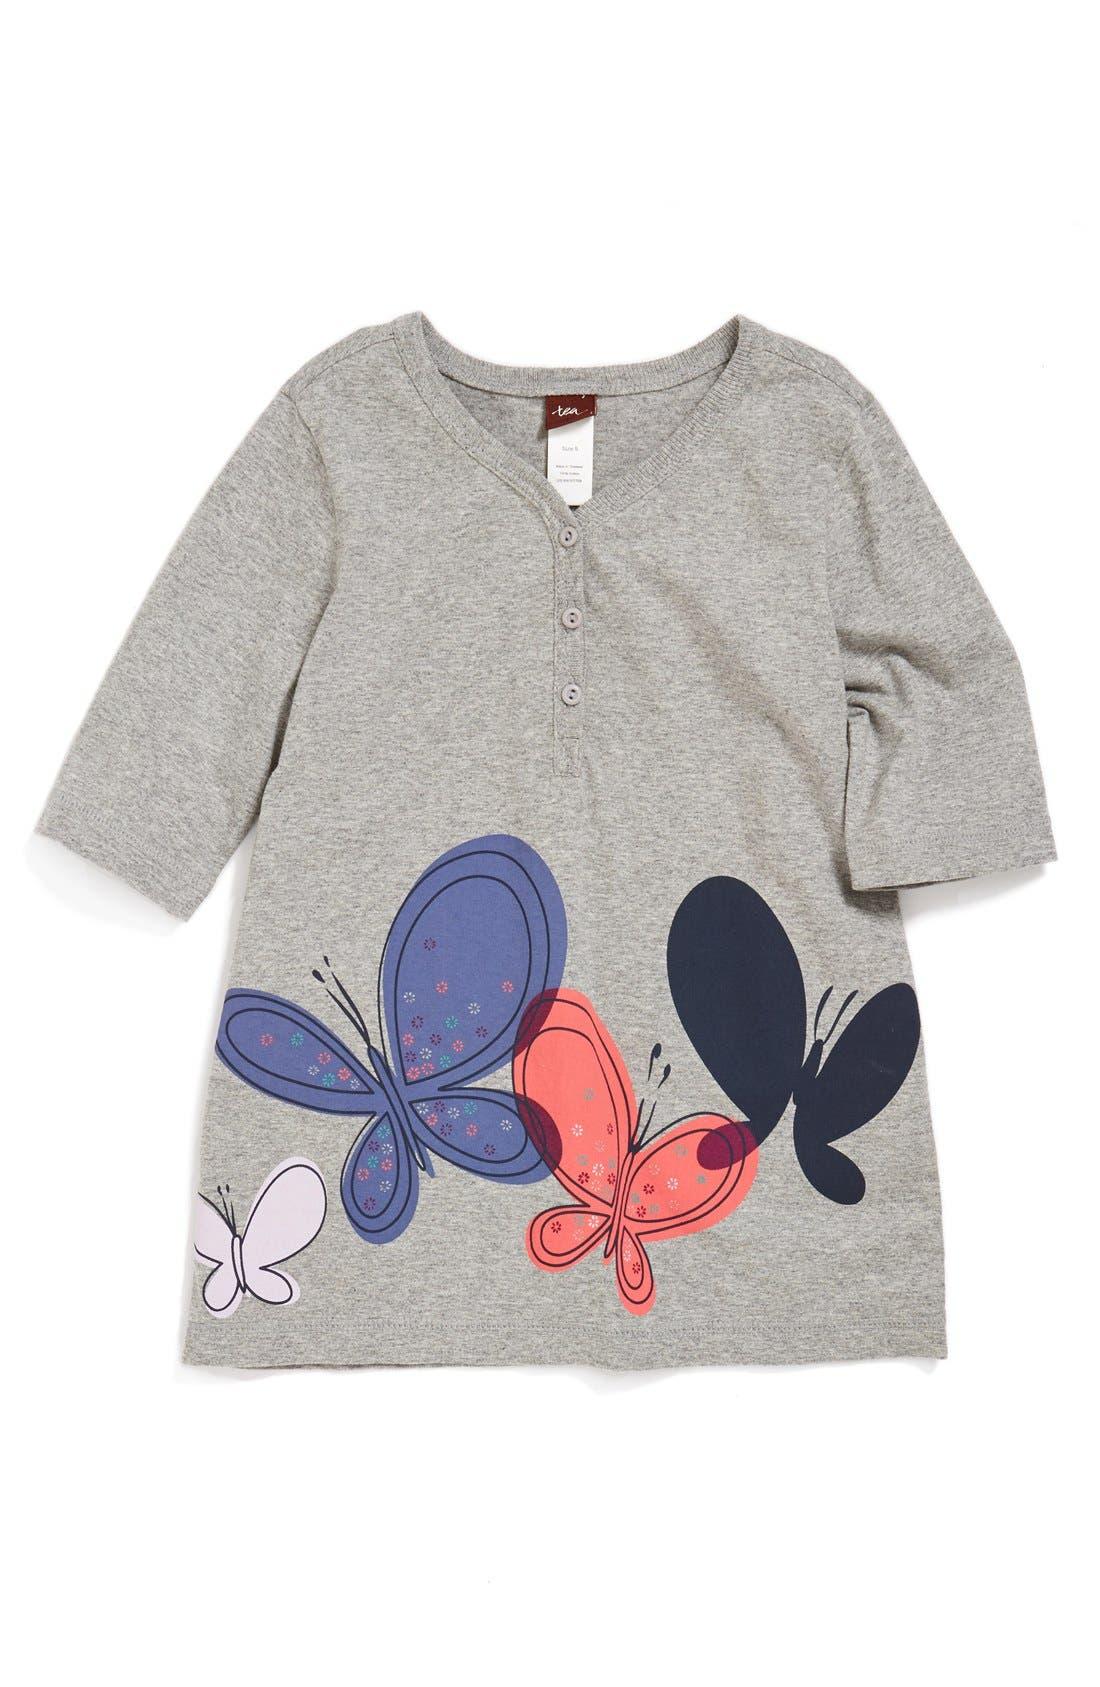 Alternate Image 1 Selected - Tea Collection 'Schmetterling' Henley Tee (Toddler Girls, Little Girls & Big Girls)